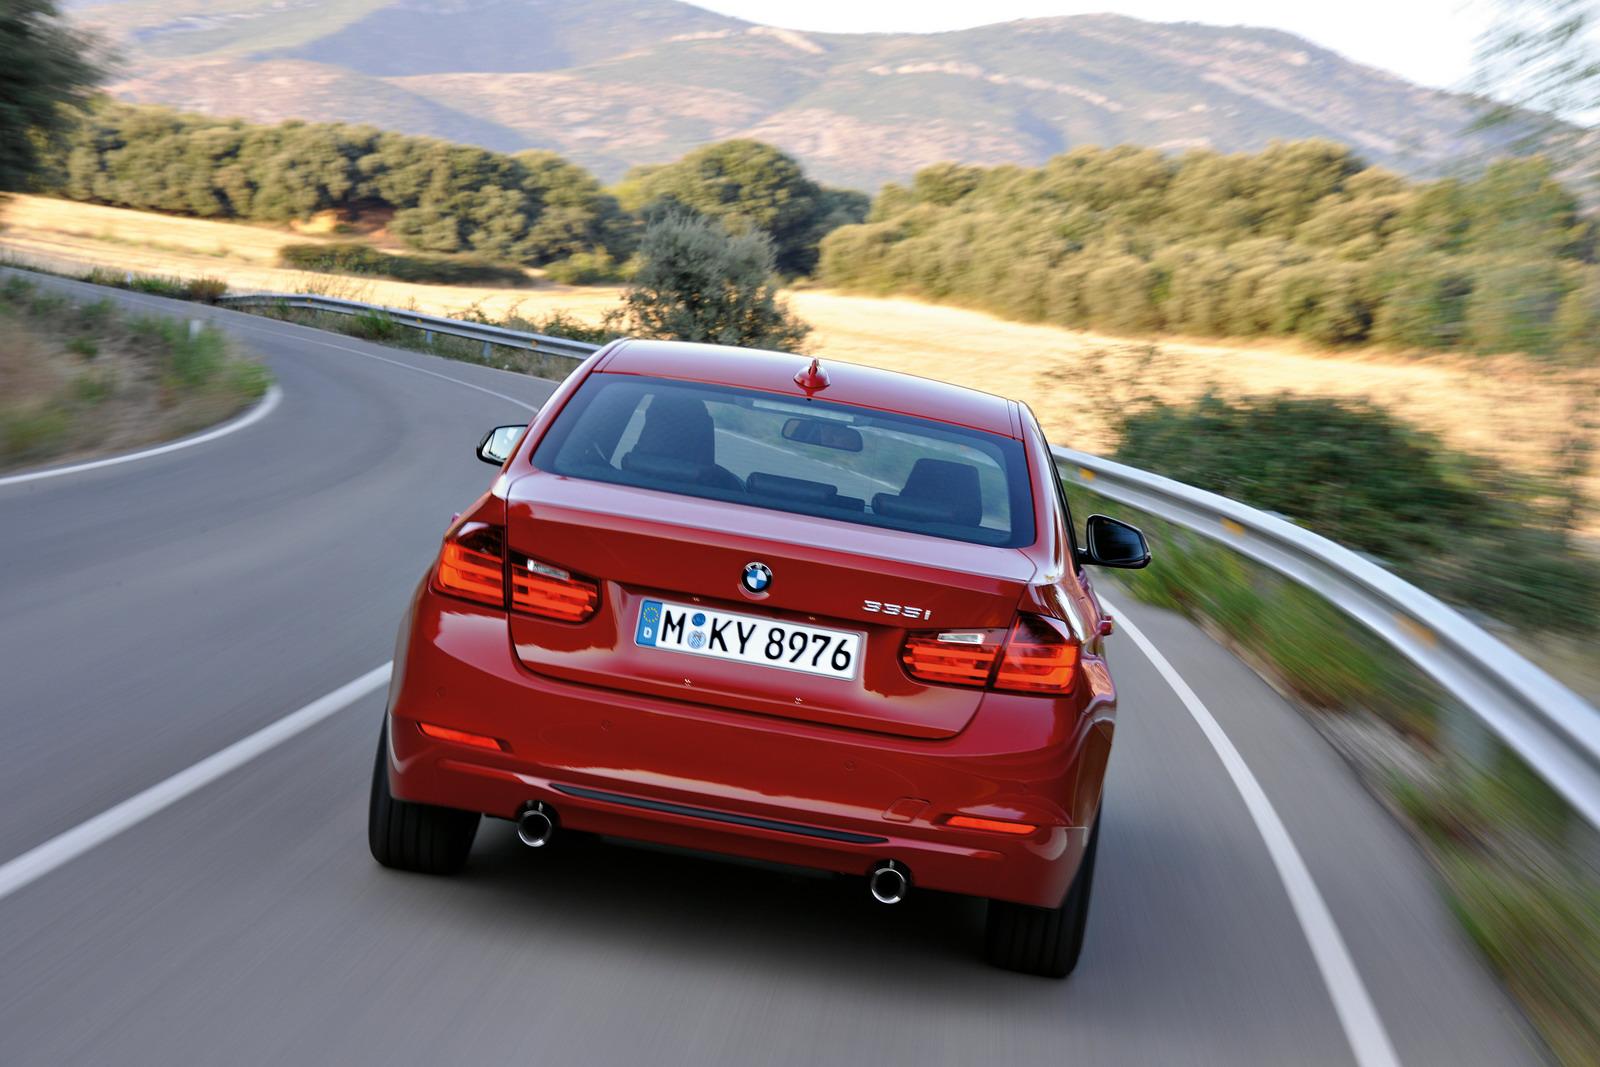 2012 F30 BMW 3 Series